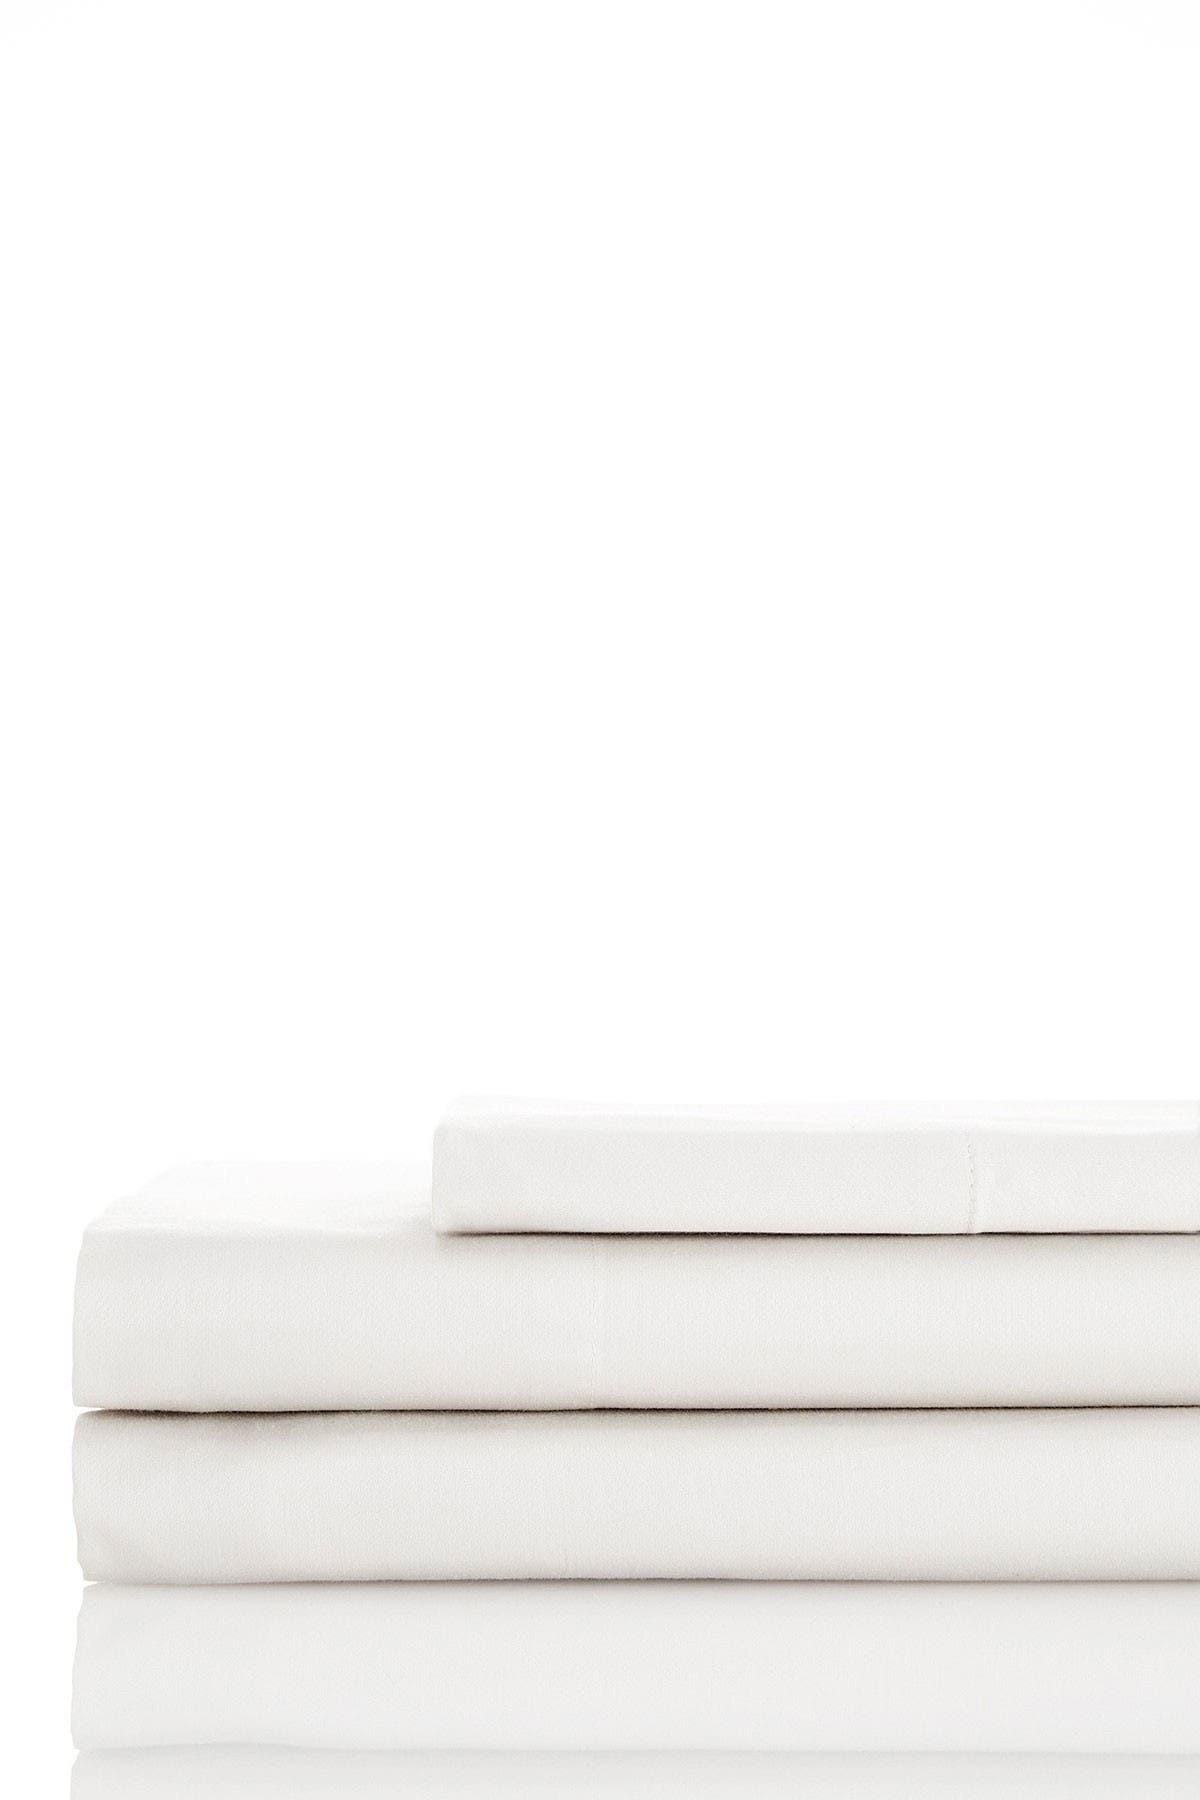 Image of Nordstrom Rack 400 Thread Count Full Sheet Set